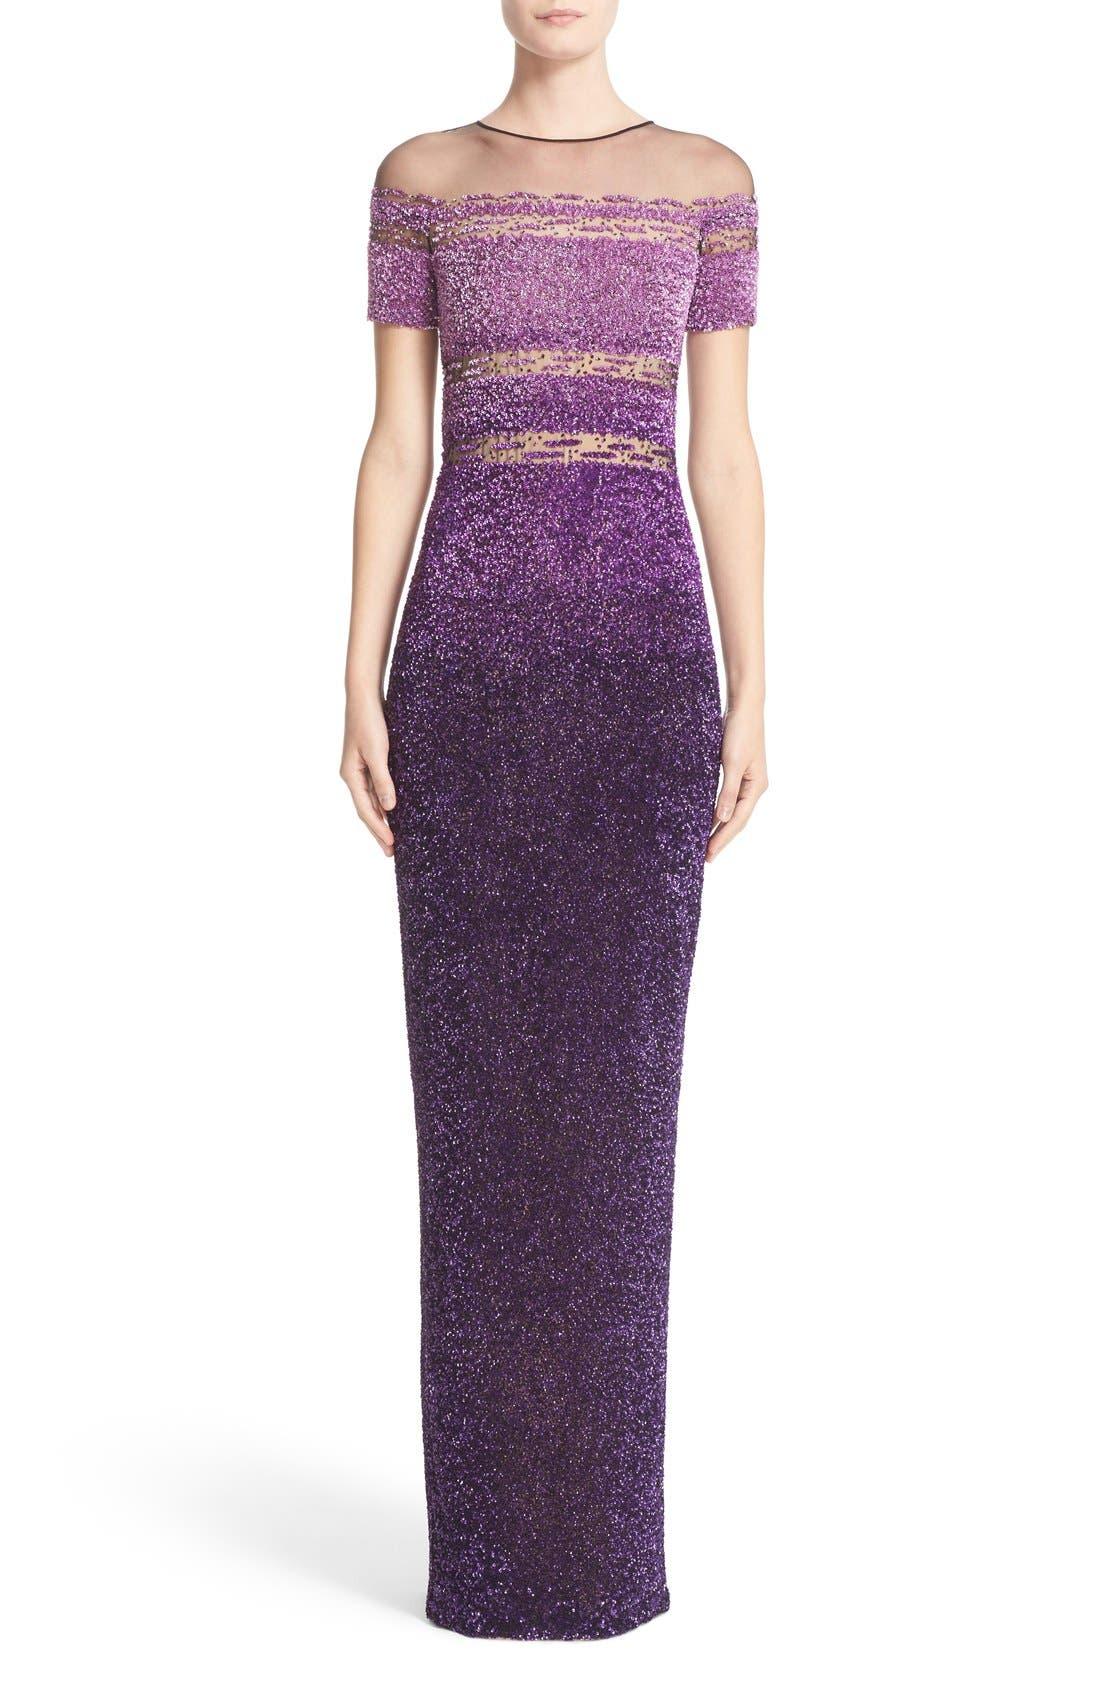 Alternate Image 1 Selected - Pamella Roland Signature Sequin Short Sleeve Column Gown